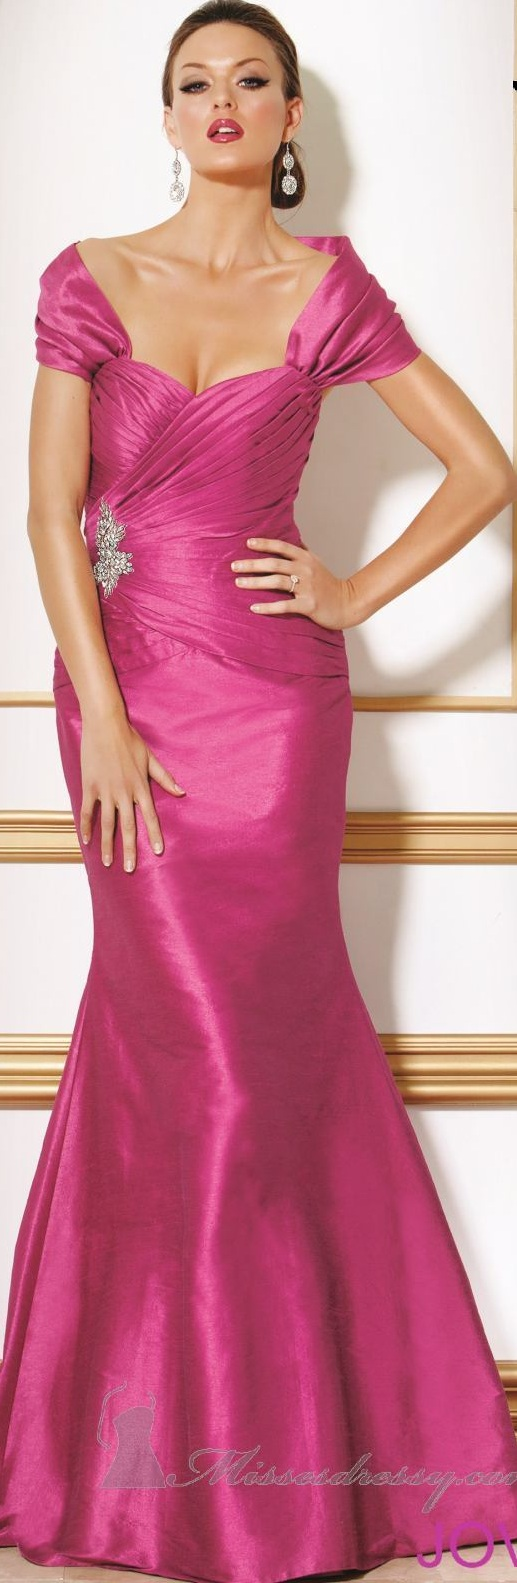 ROSITA...❤ | PINK!!!....❤ | Pinterest | Moda para dama, Ropa y ...